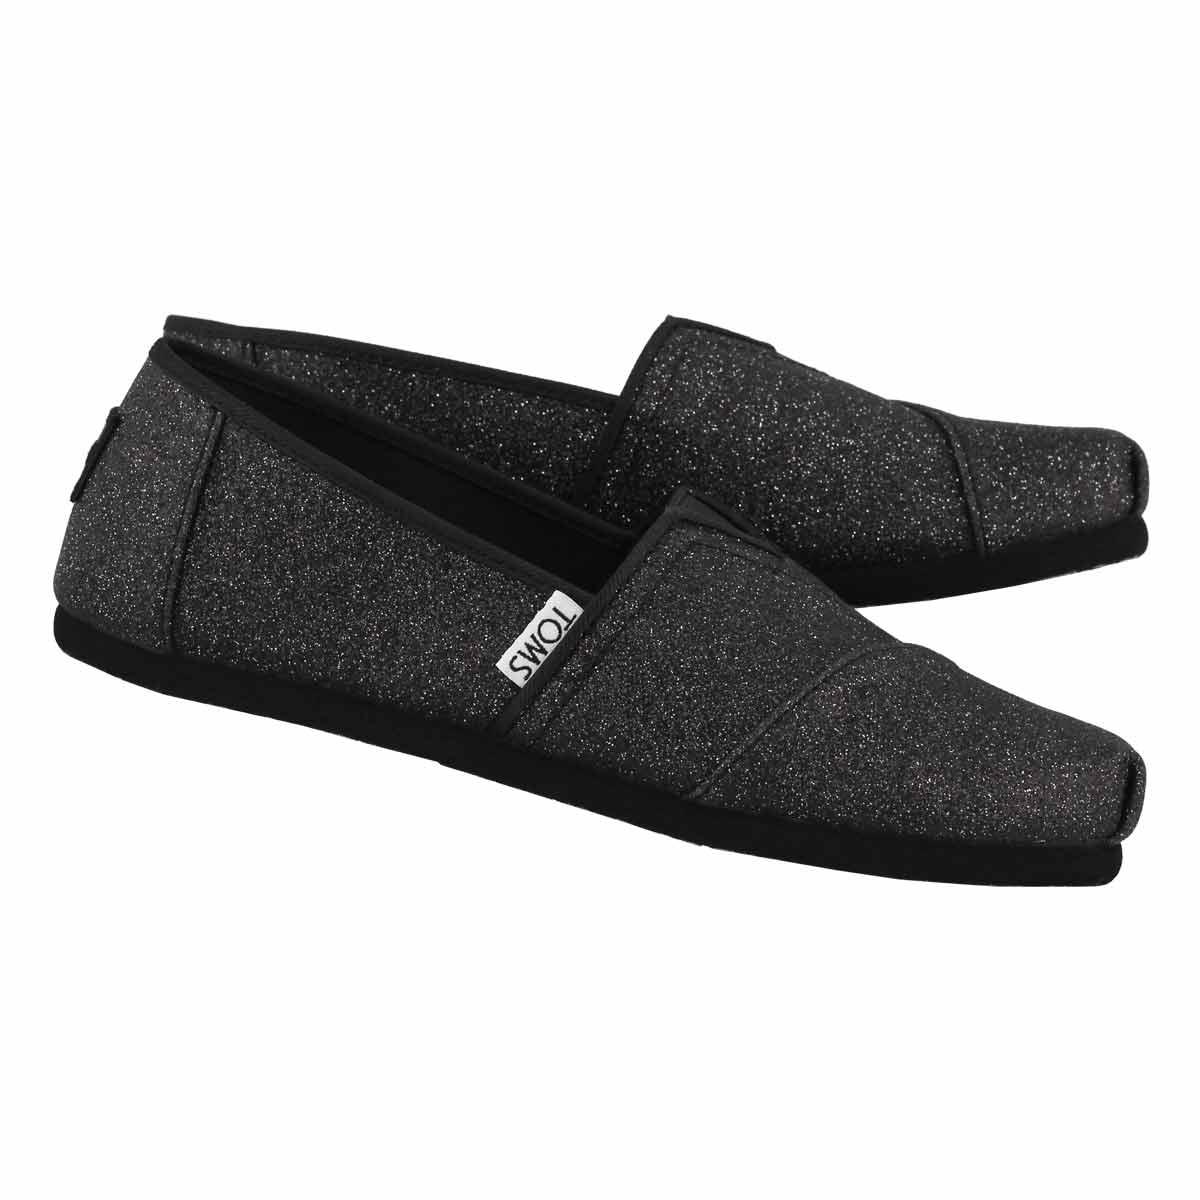 Grls Classic Seasonal blk glimmer loafer